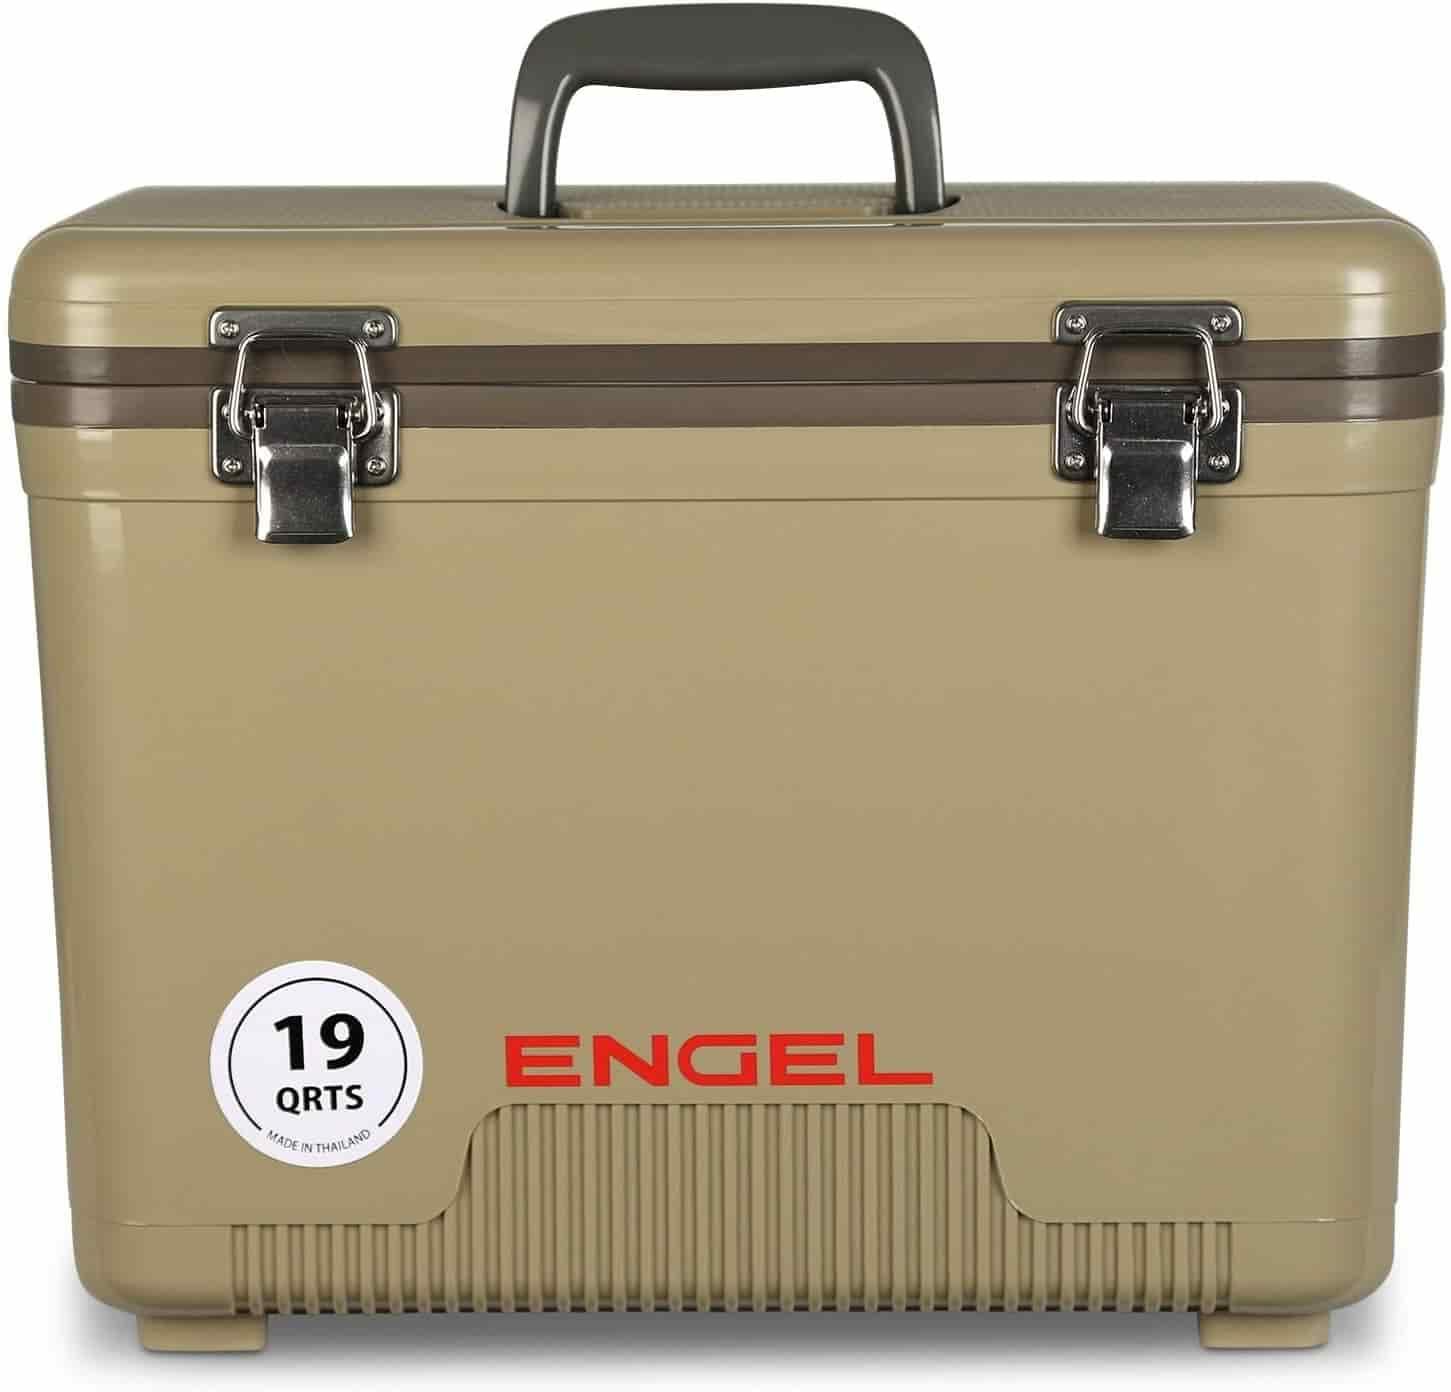 Engel Cooler 19 QT